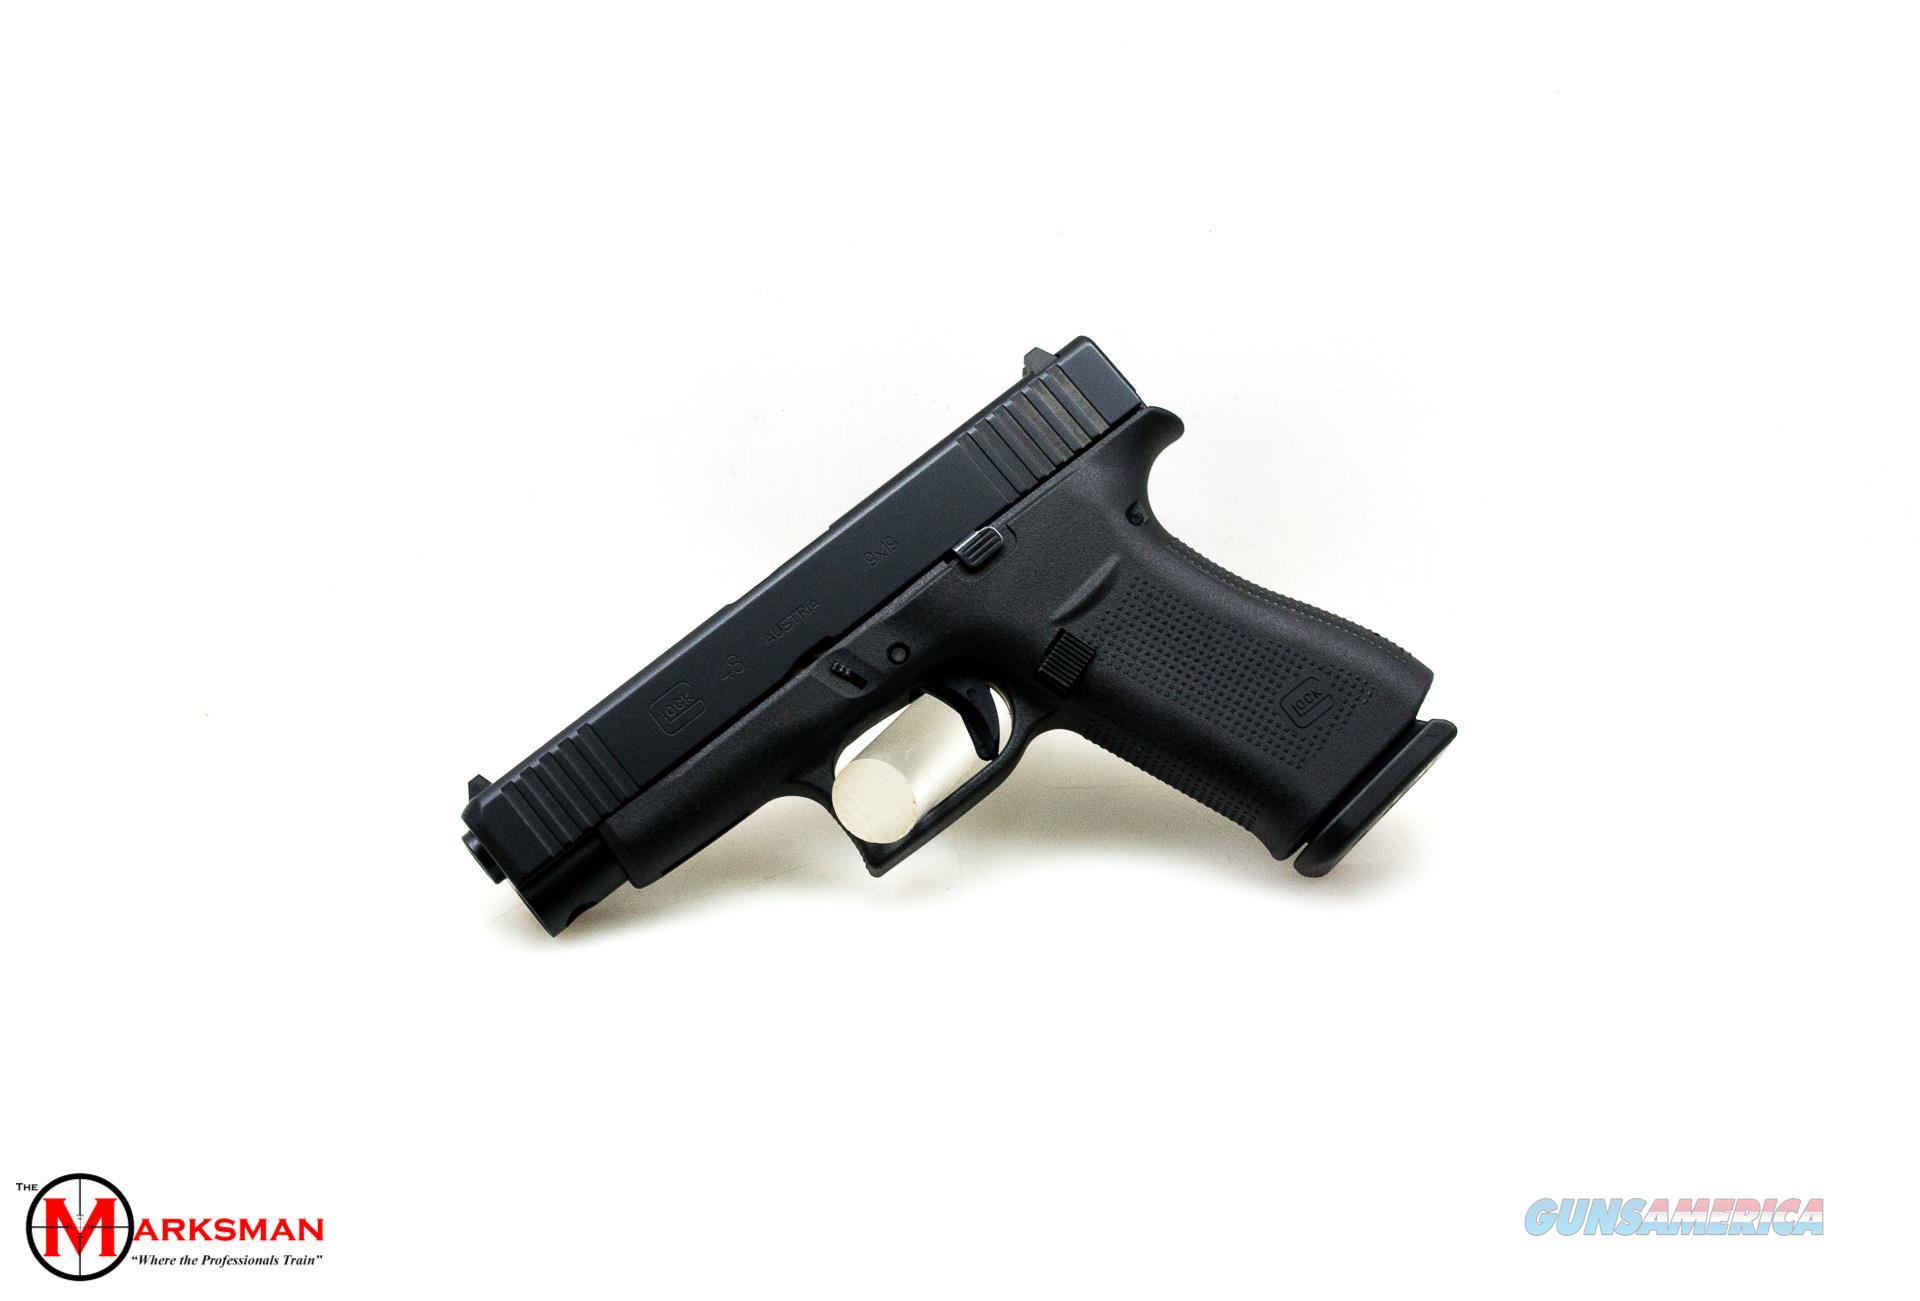 Glock 48, 9mm NEW Black Slide Finish  Guns > Pistols > Glock Pistols > 48